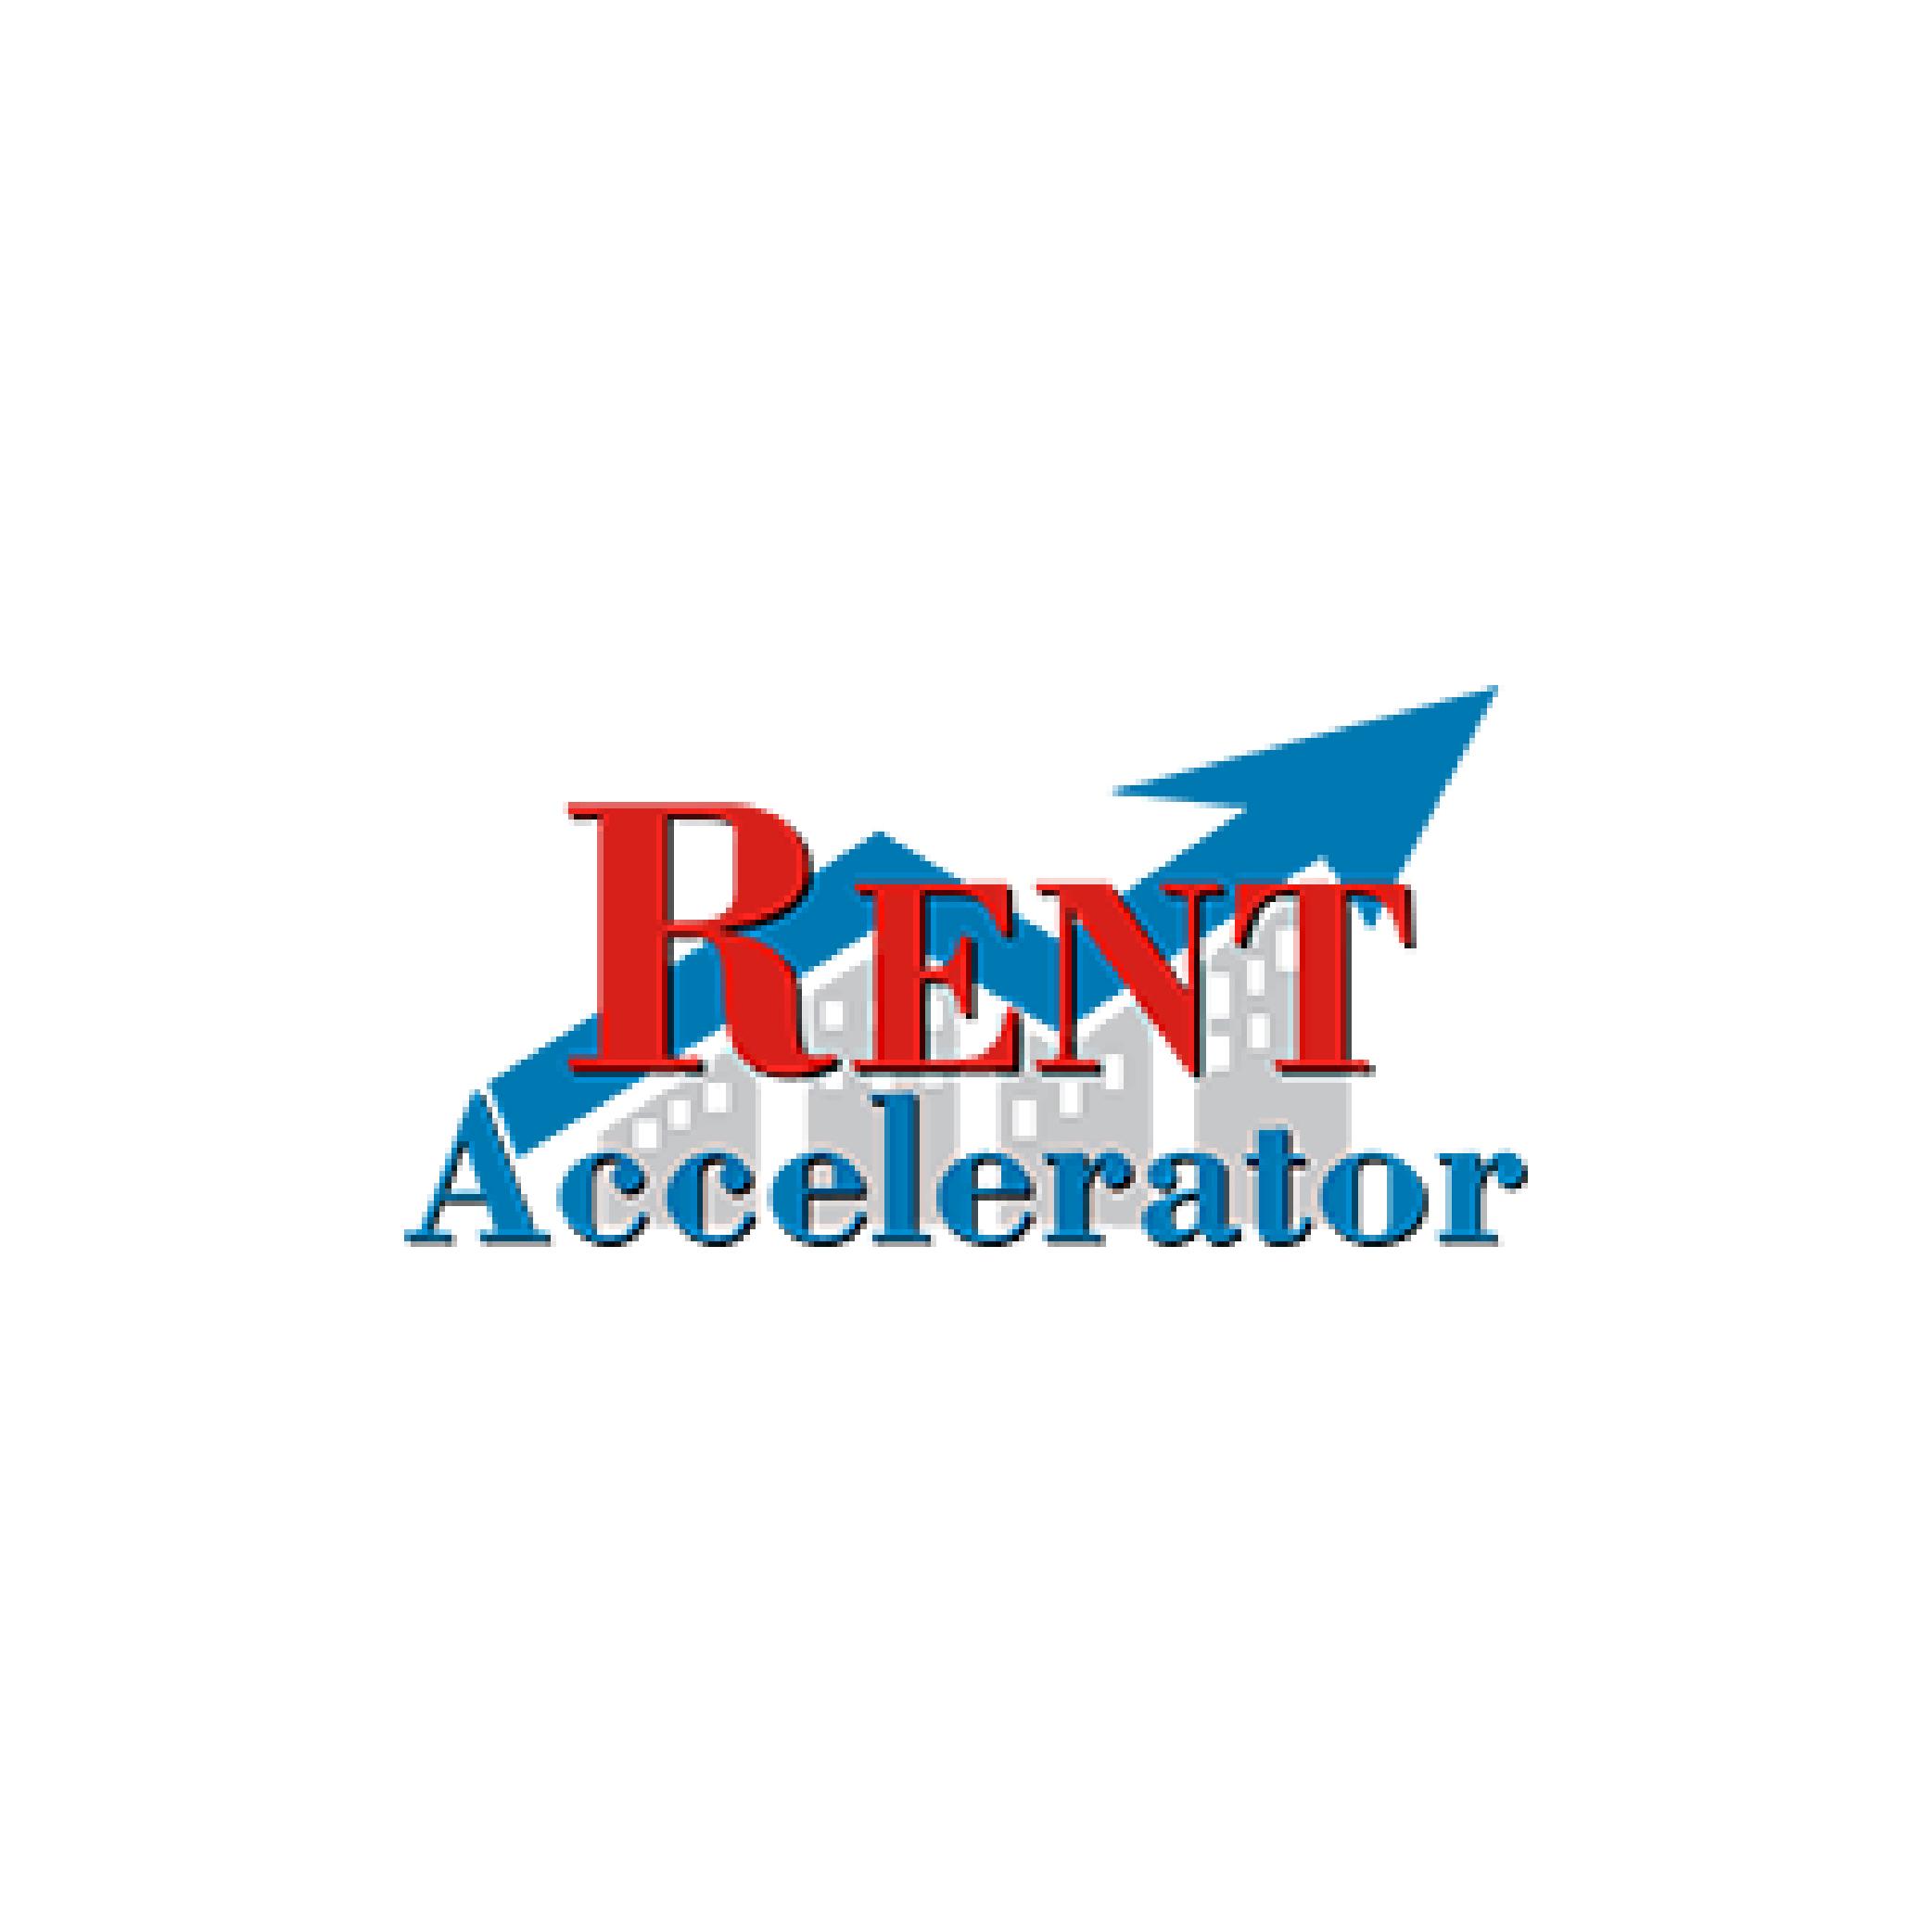 Rent Accelerator Box-01.jpg